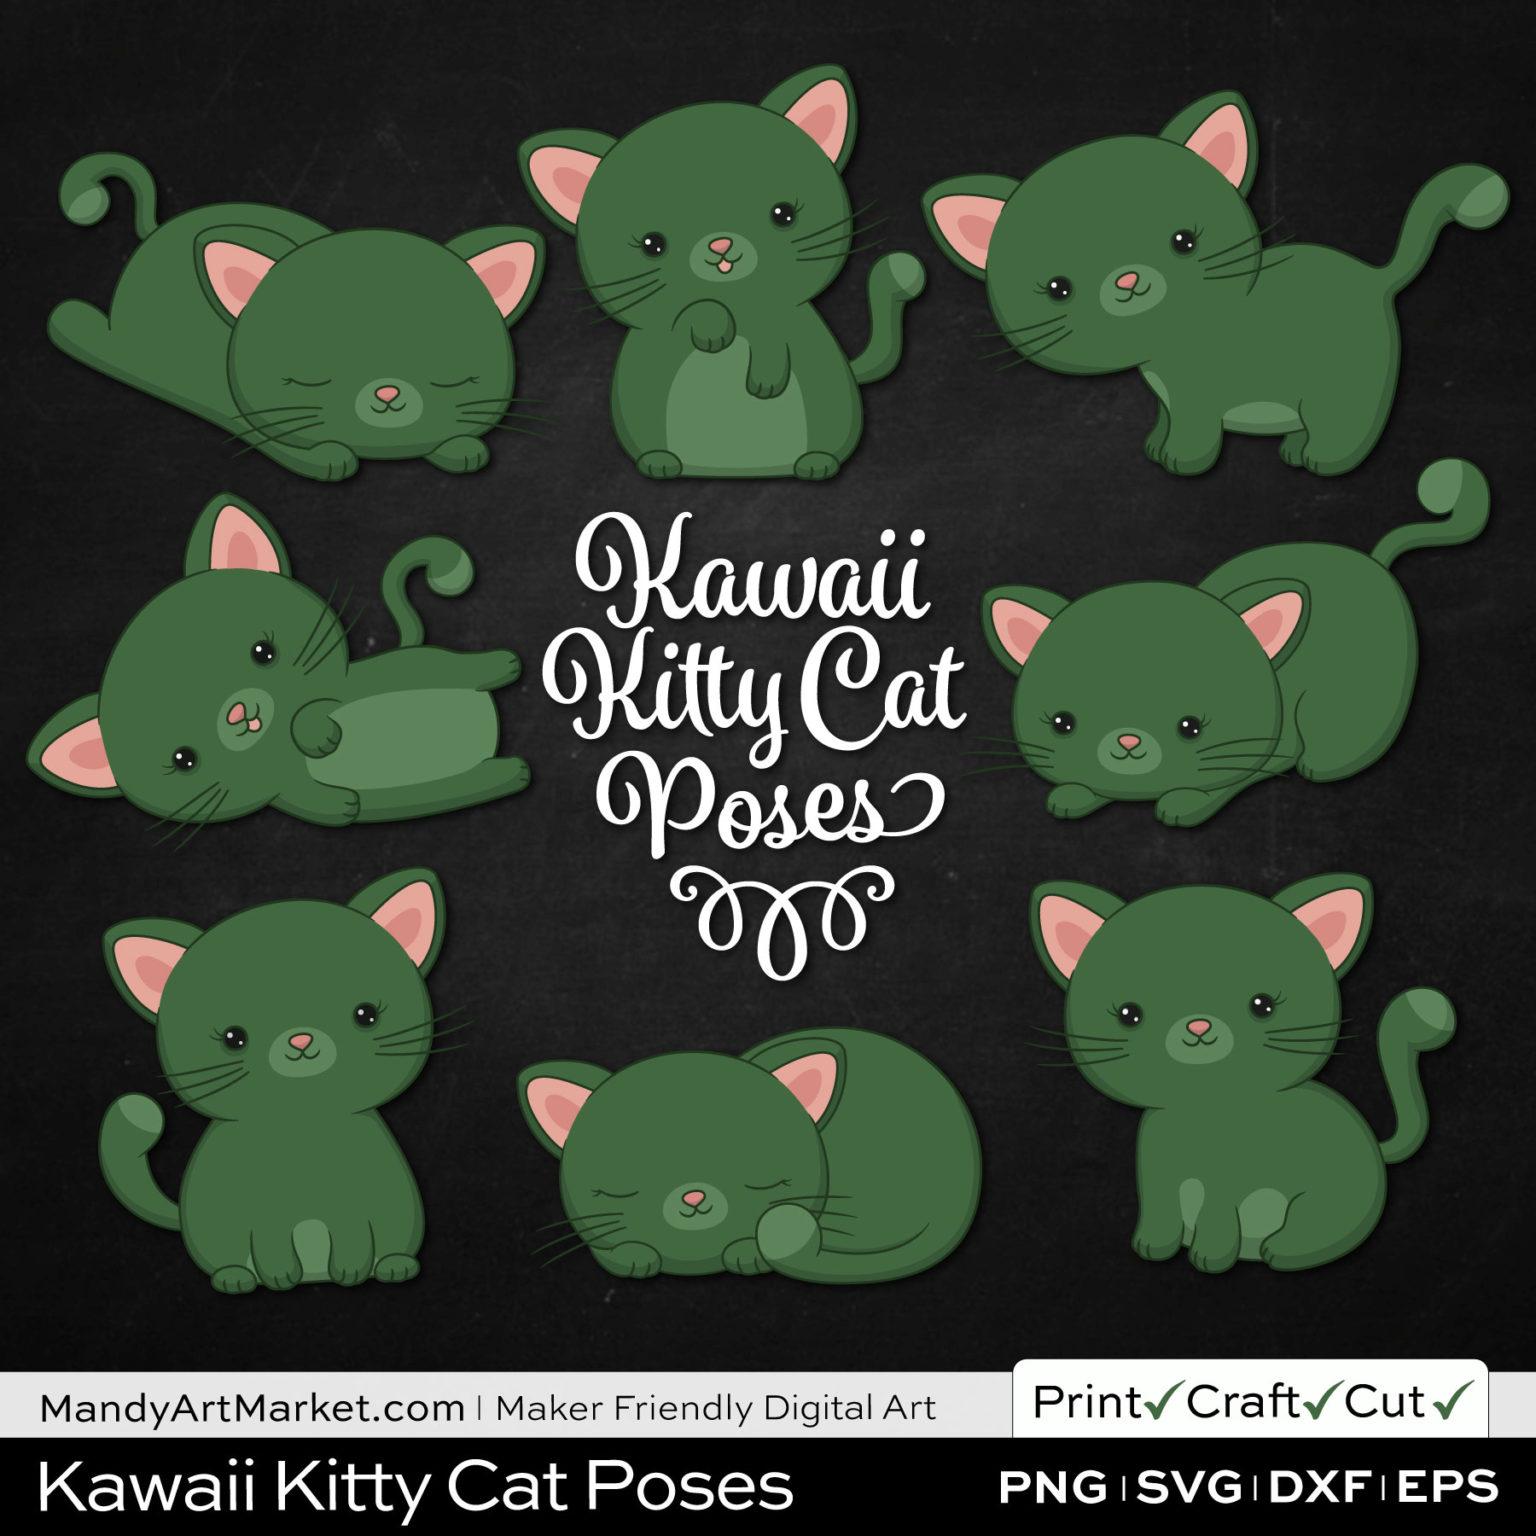 Hemlock Green Kawaii Kitty Cat Poses Clipart on Black Background